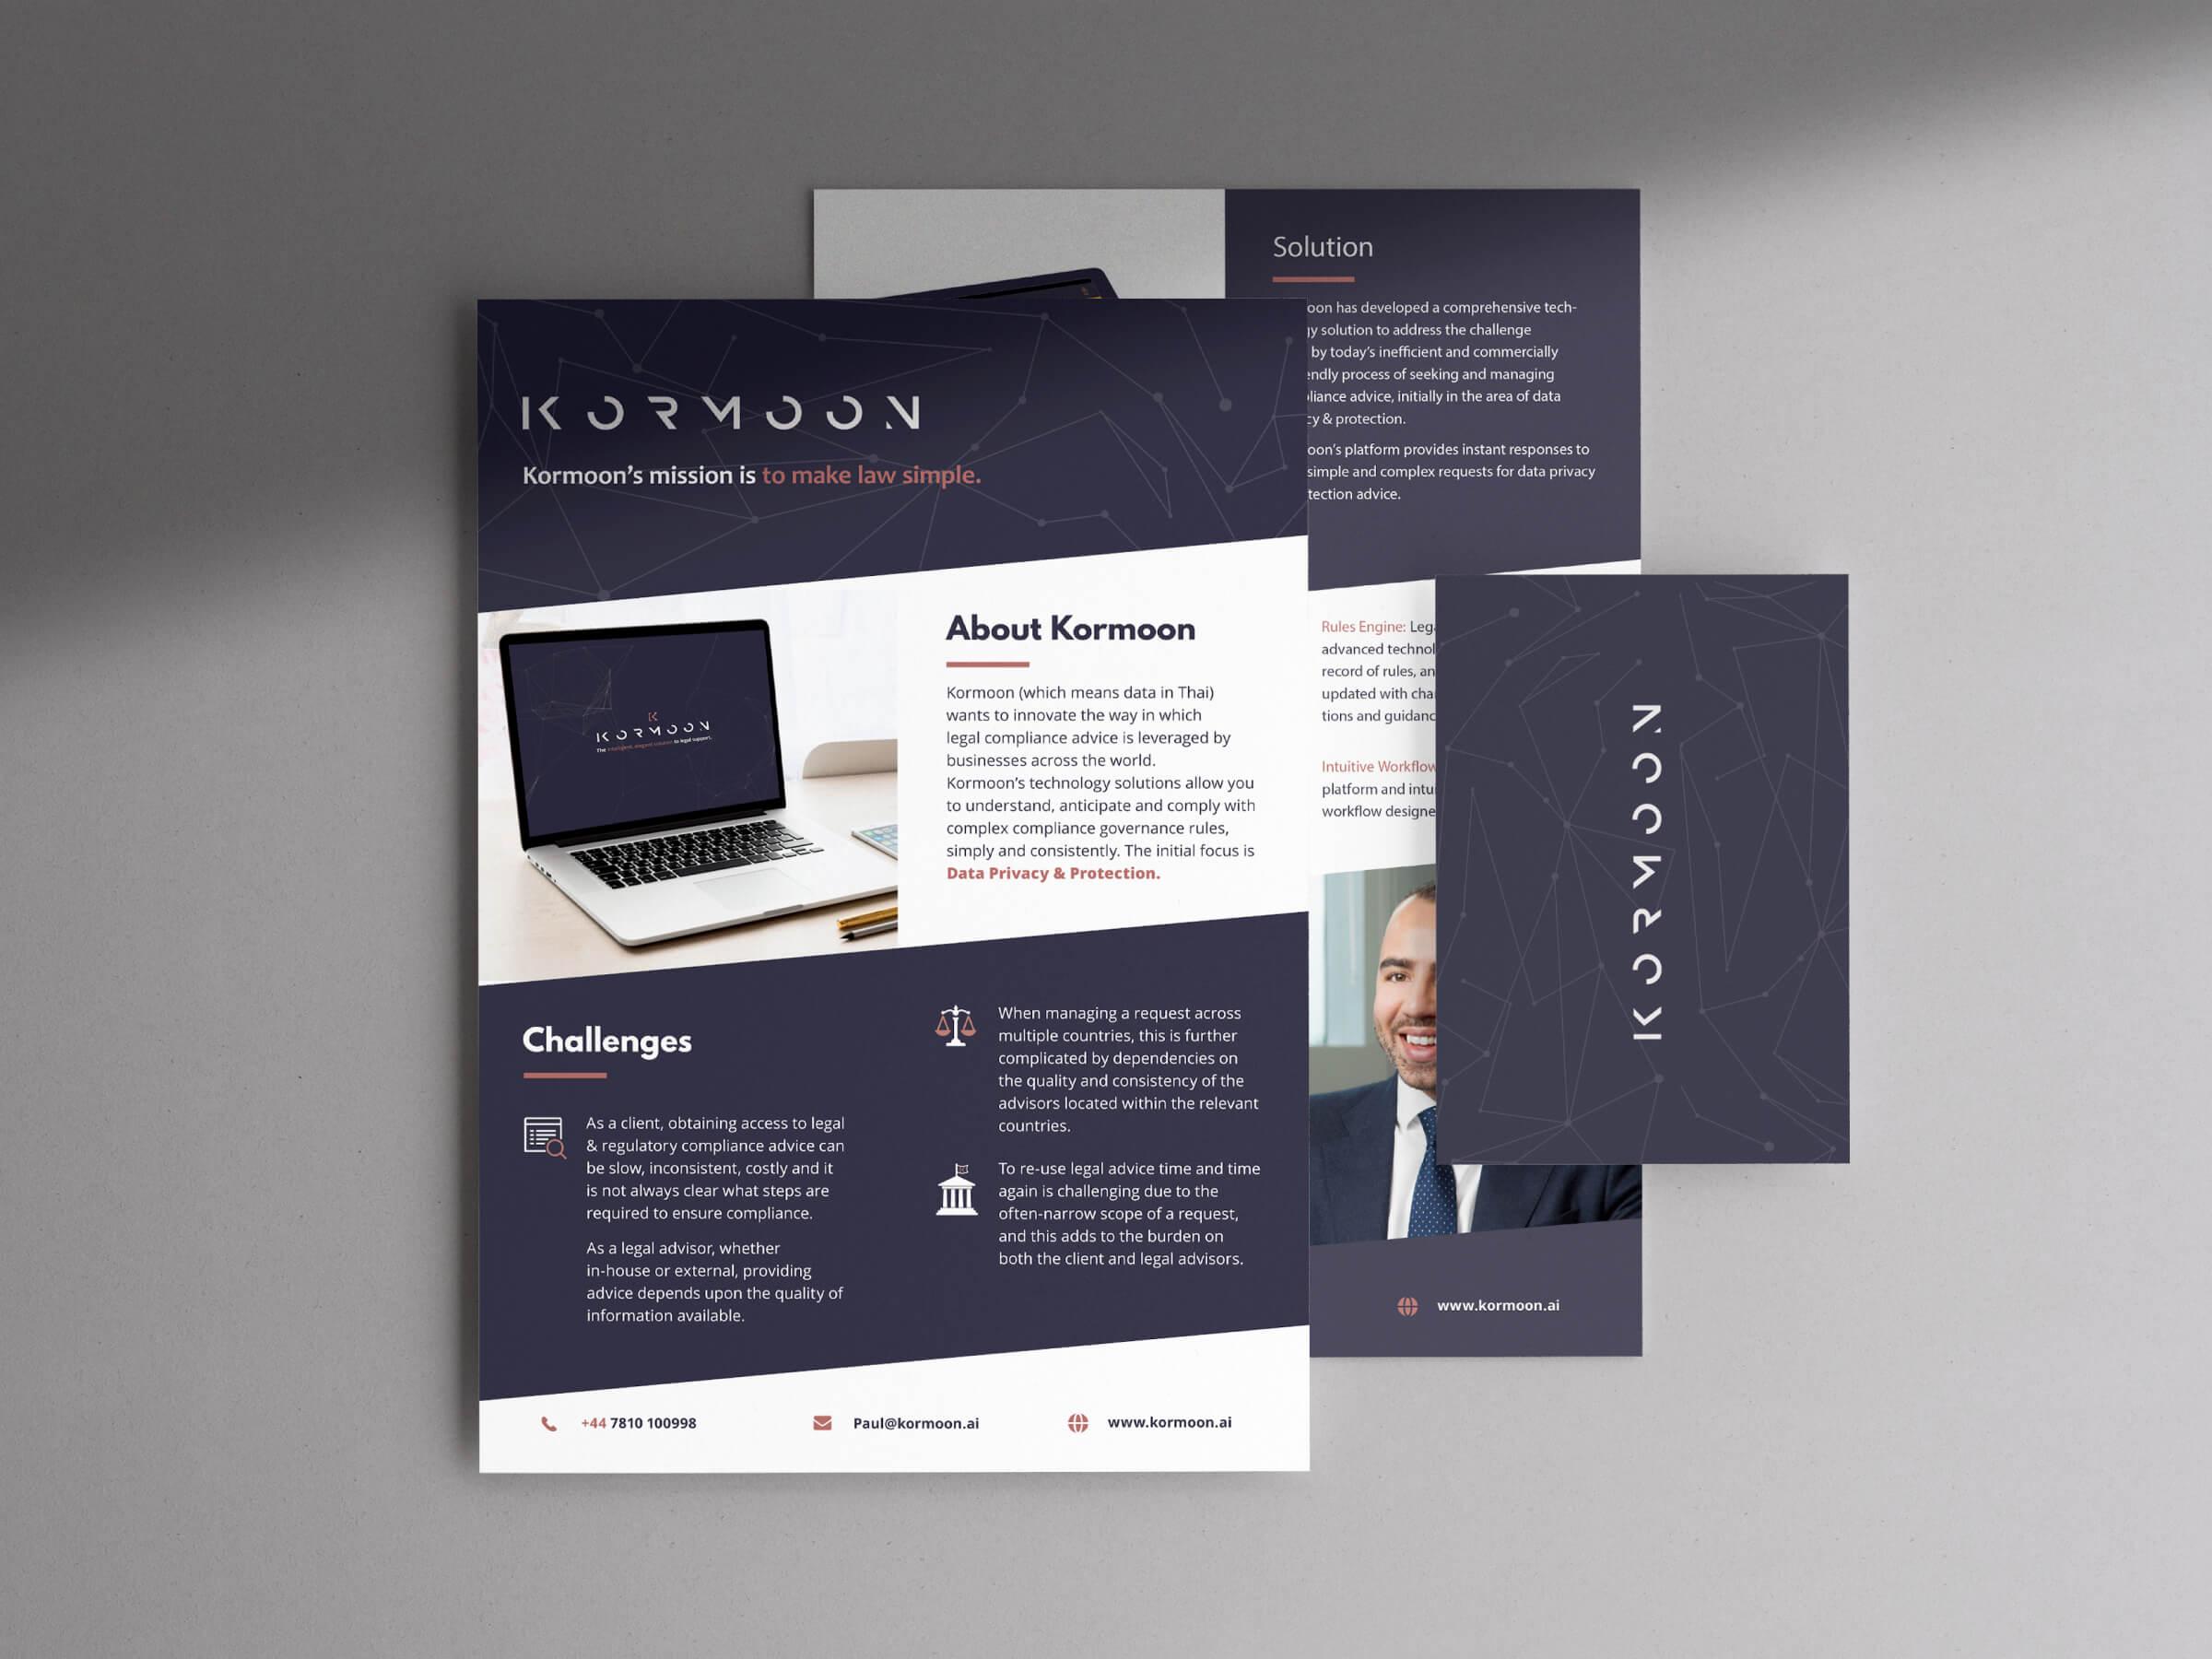 Kormoon_flyer-1